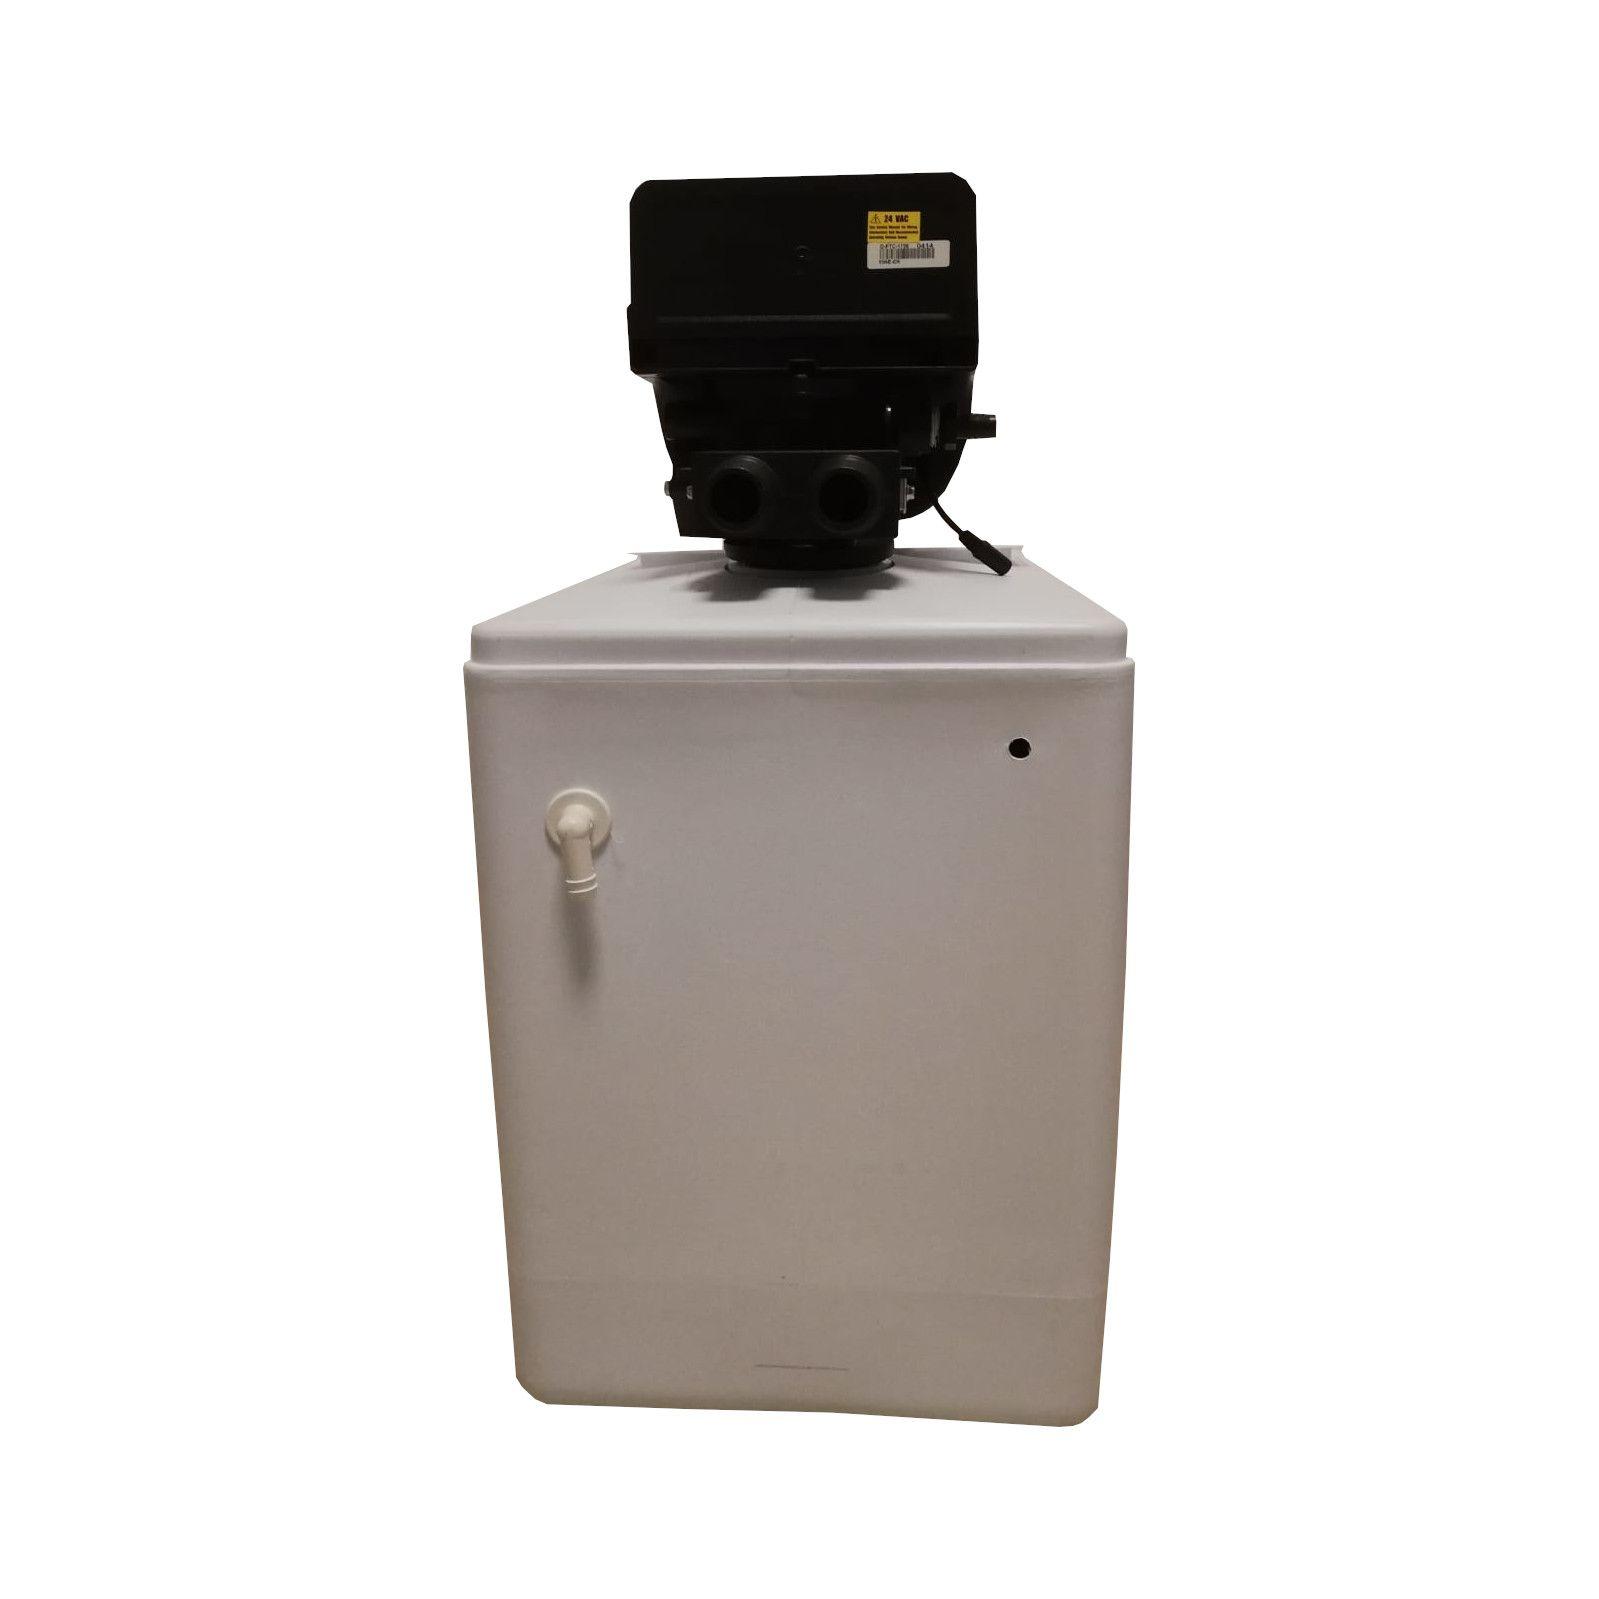 Dedurizator apa Aqua Mini 12-DM, Debit 0.72 mc/h, Capacitate filtrare 12.400 litri, Cartus din Rasina Cationica - AquaFilters.ro